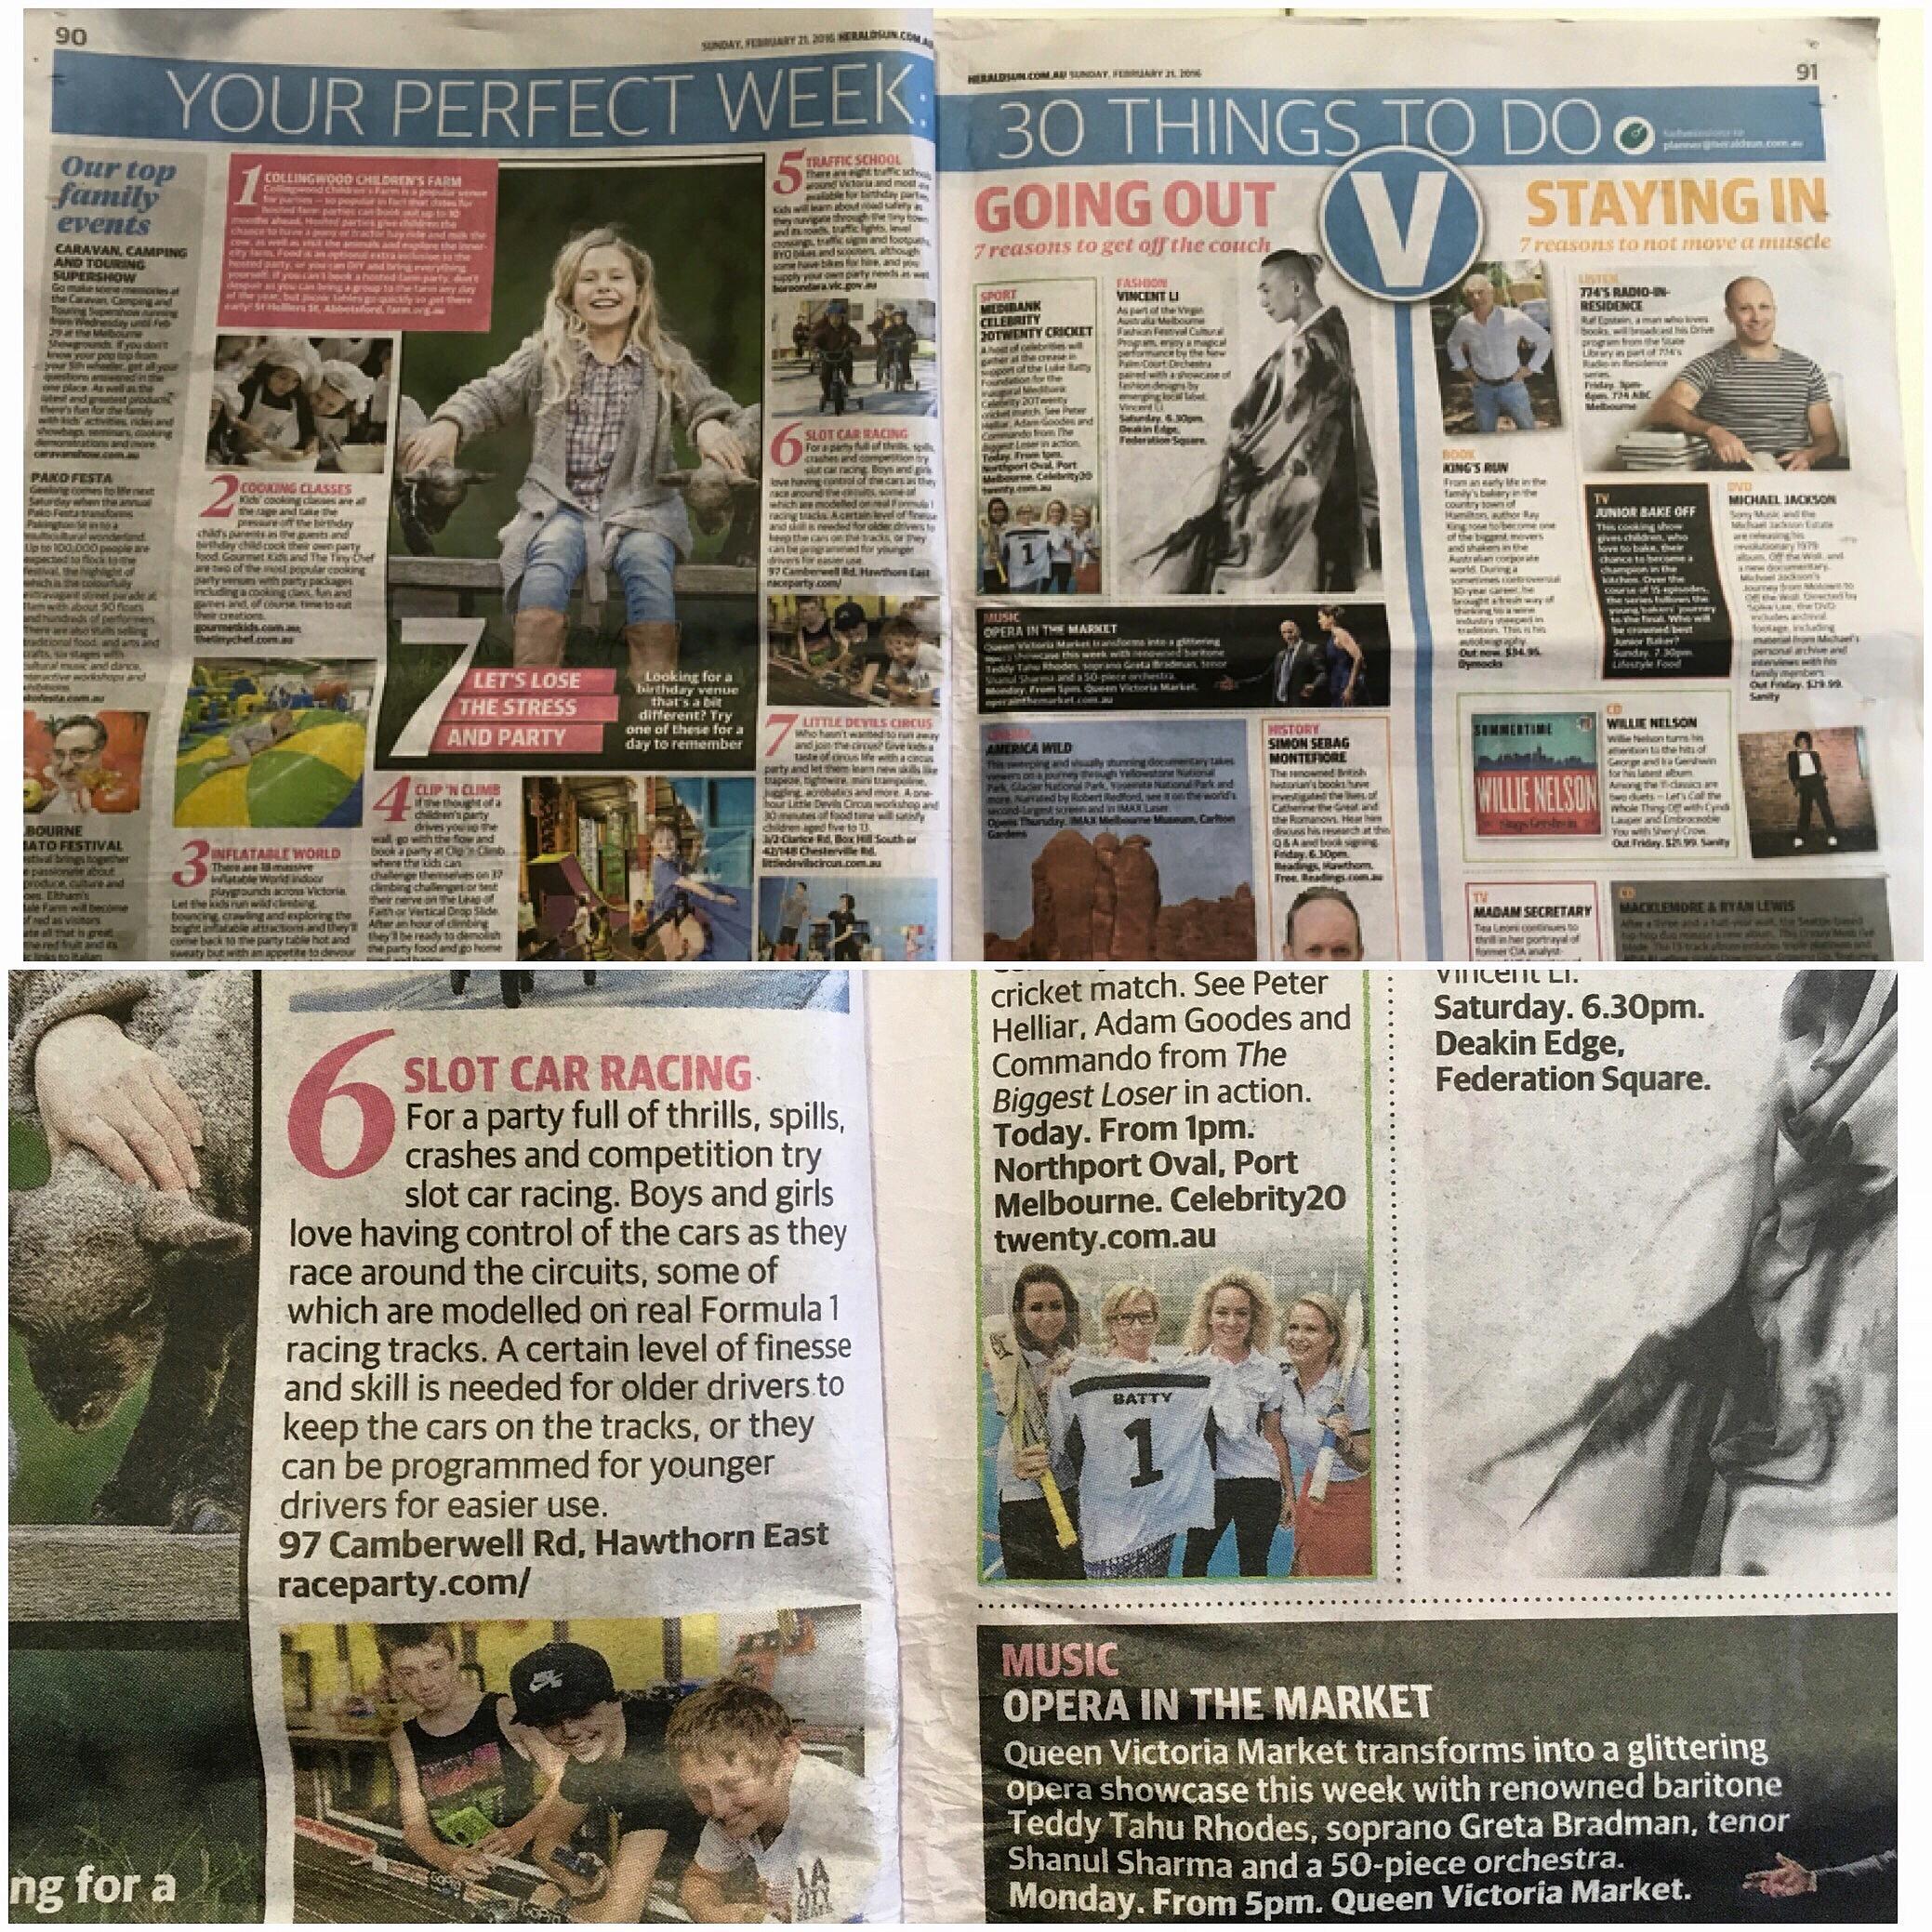 Herald Sun recommends Raceparty